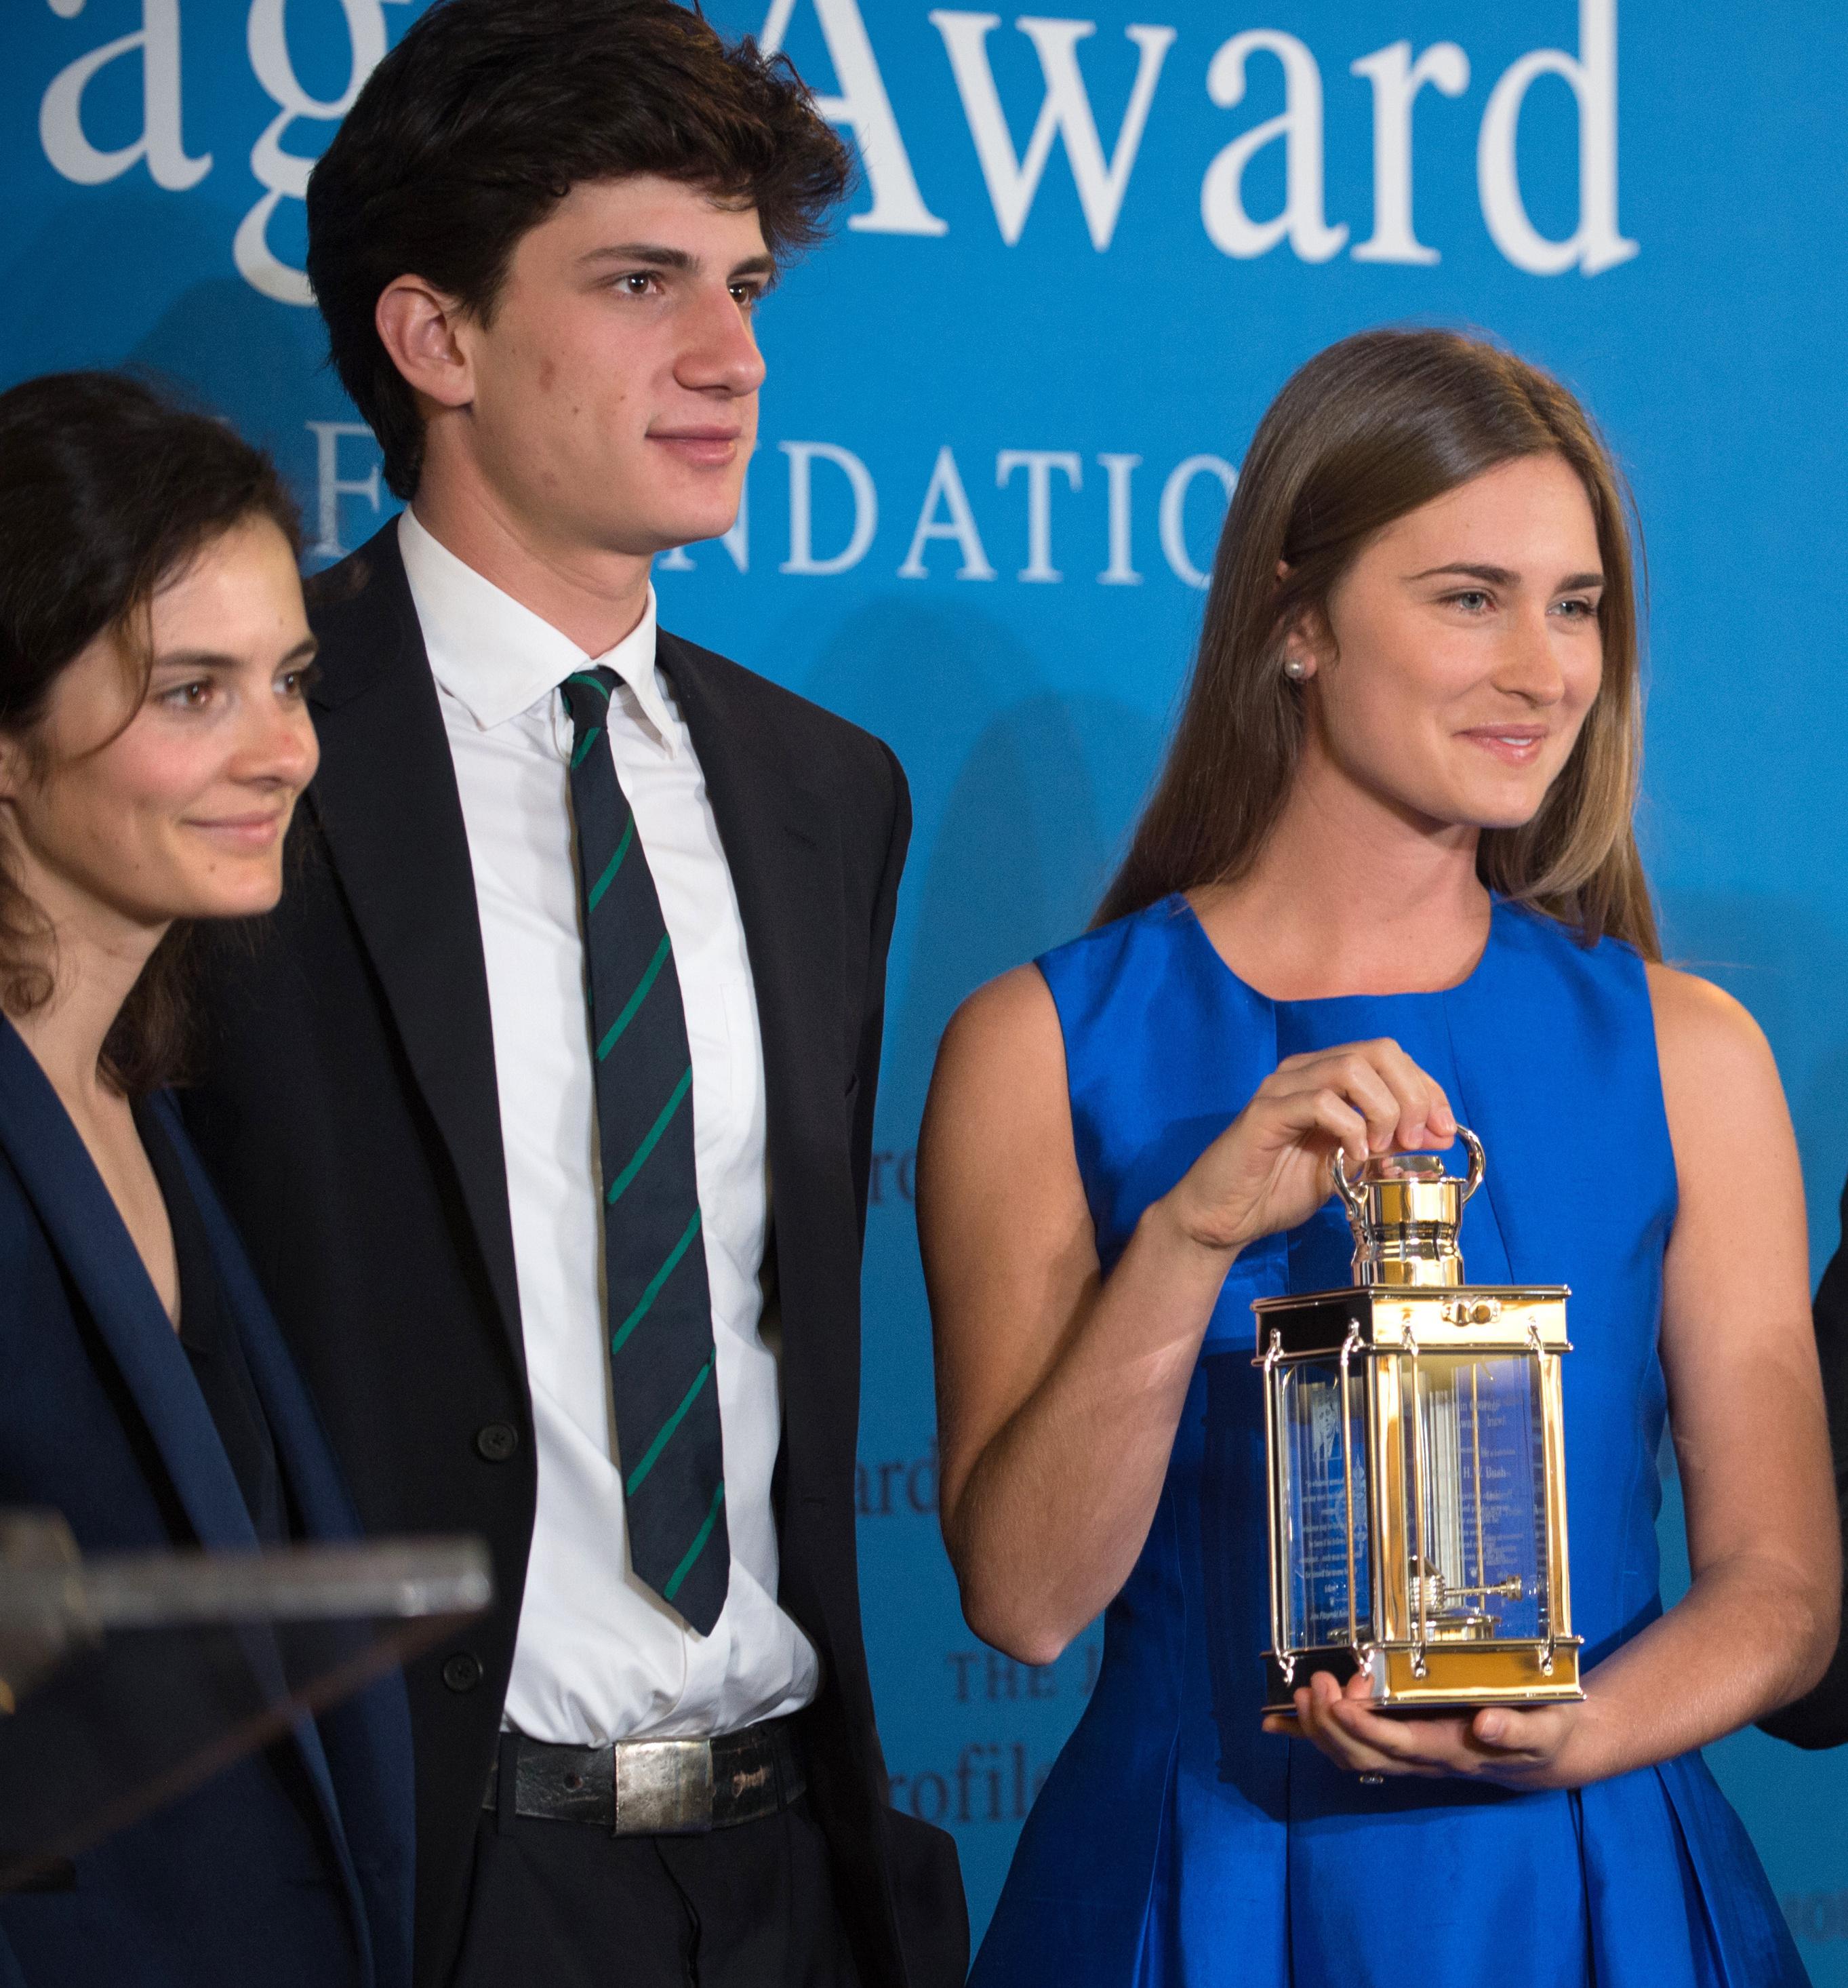 Ghw Bush Given Kennedy Award The Spokesman Review